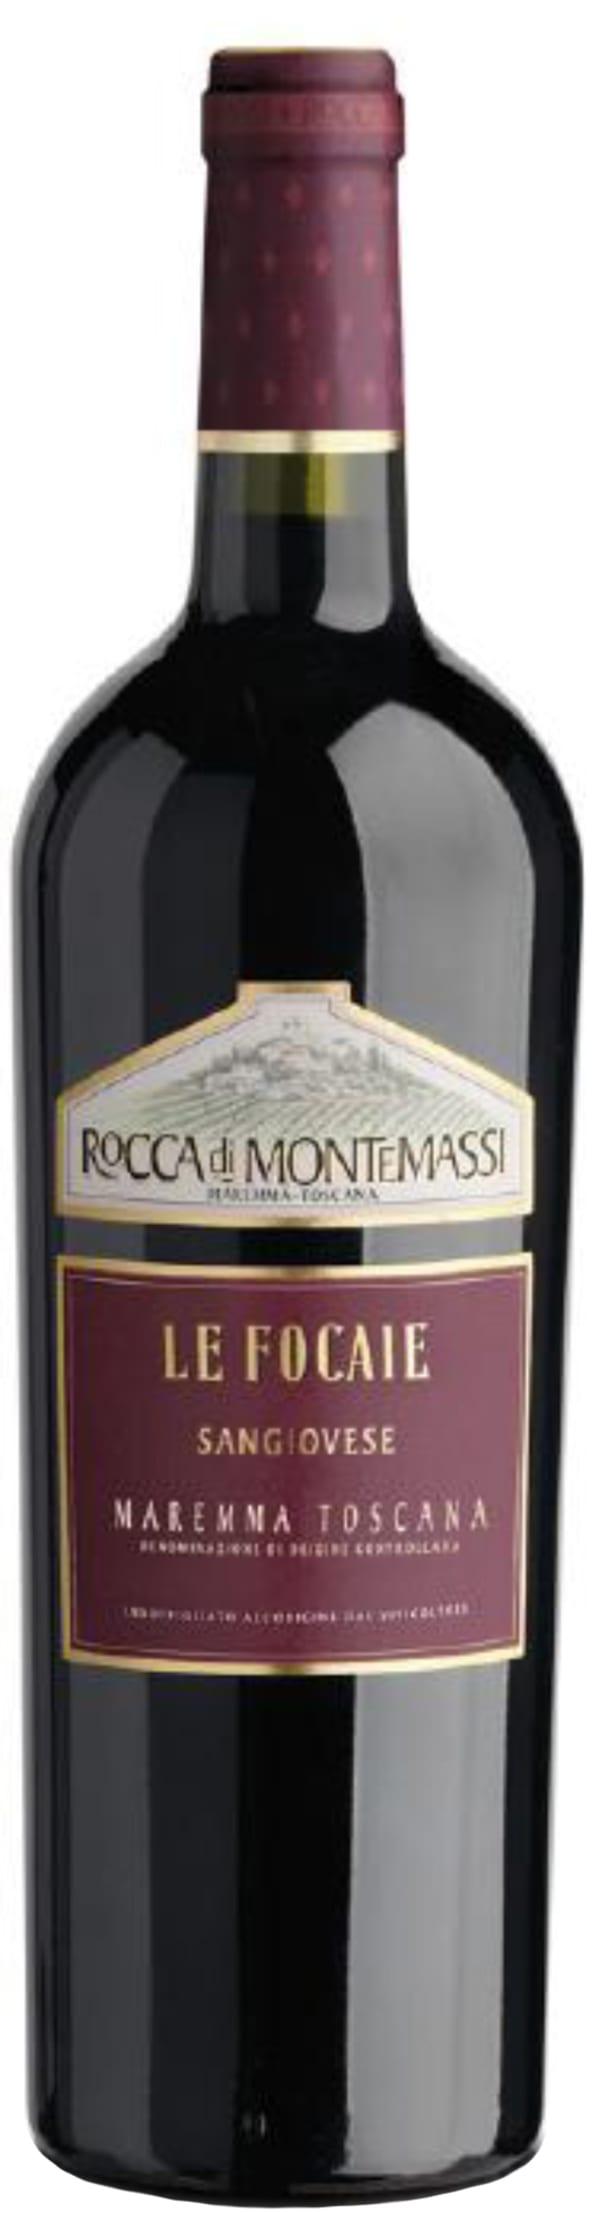 Rocca Di Montemassi Le Focaie Sangiovese 2015